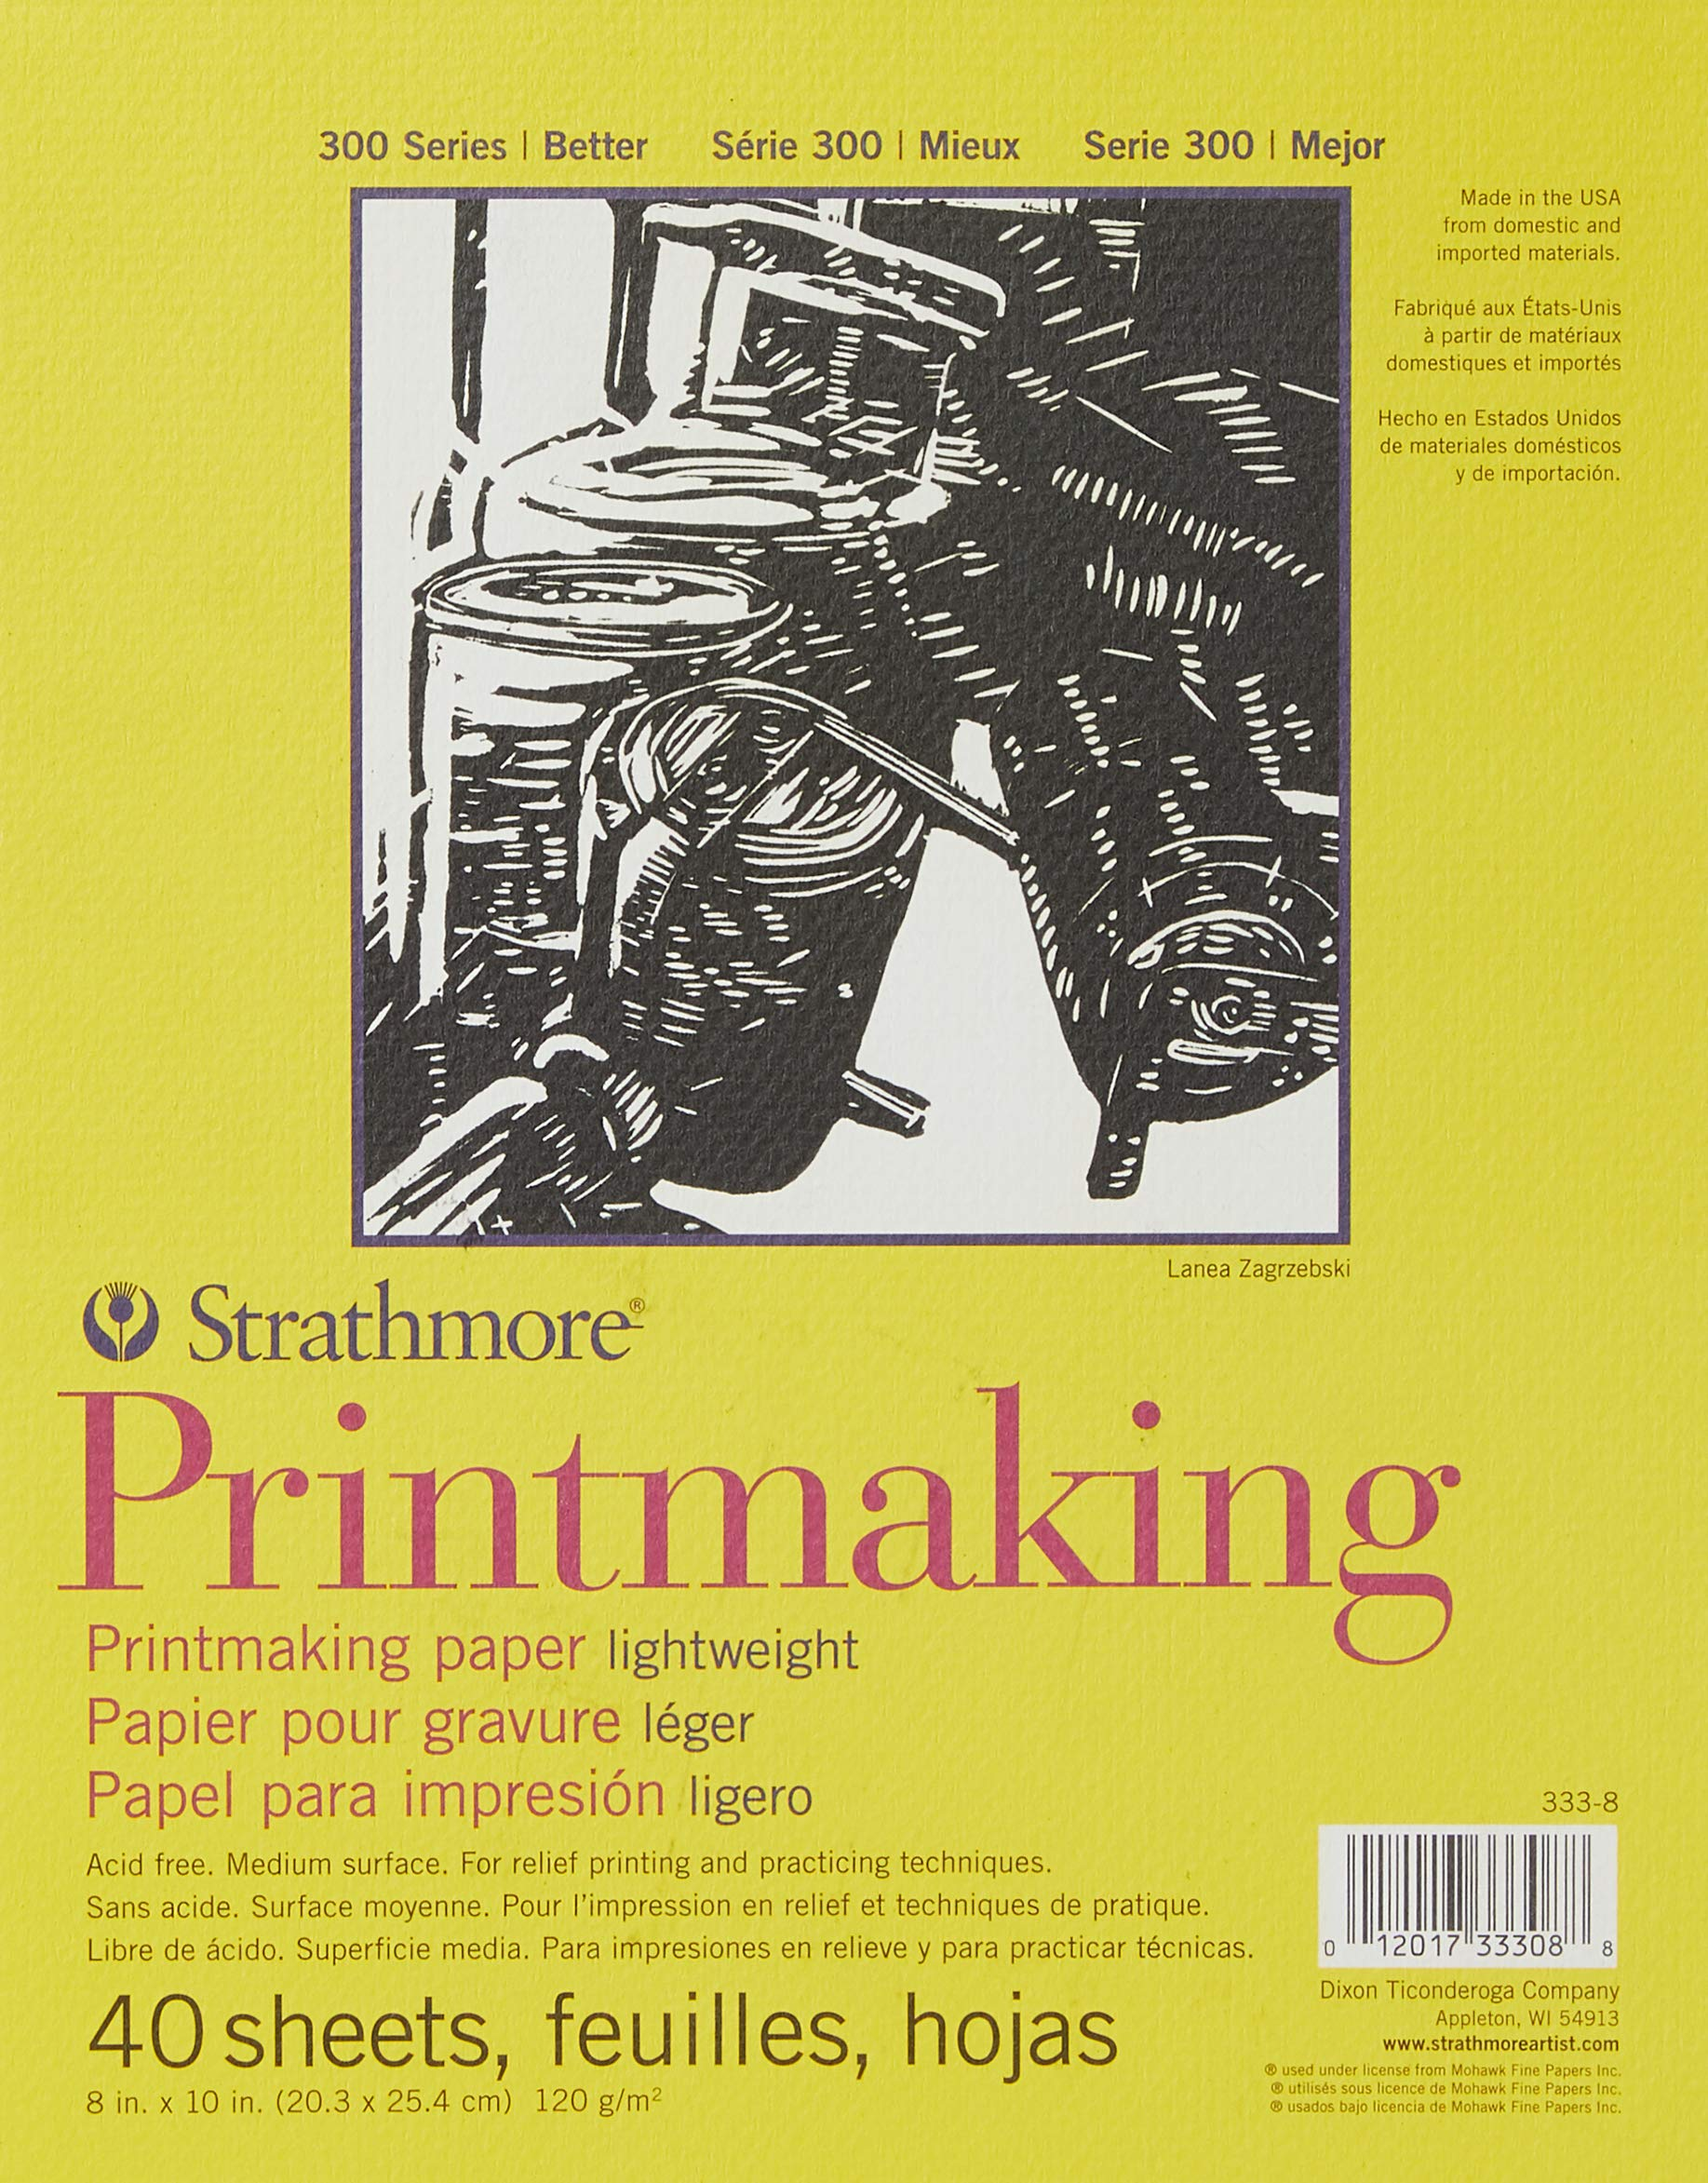 40 Hojas de impresión ligero Strathmore 20x25cm